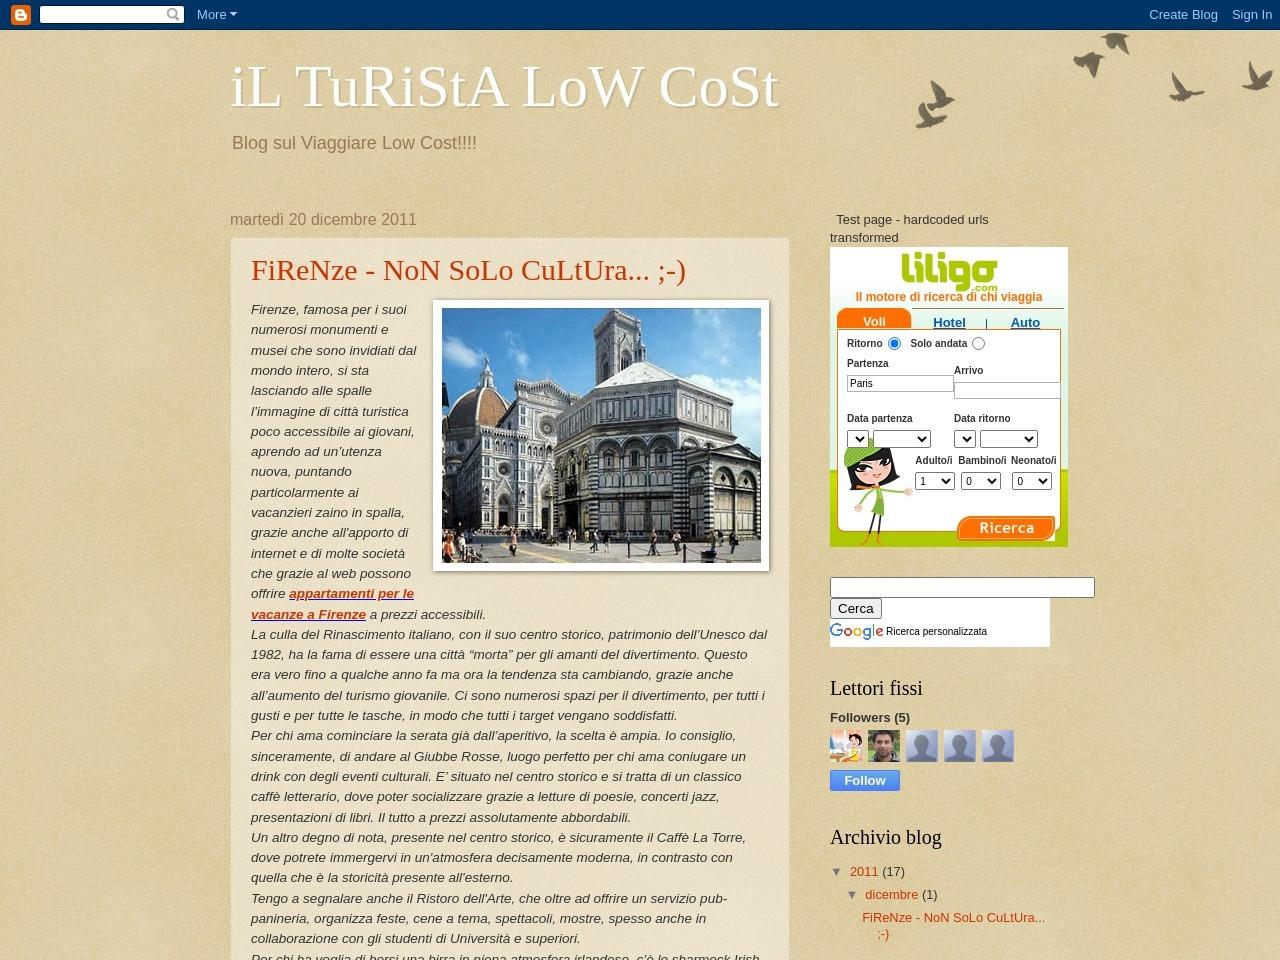 il-turista-low-cost